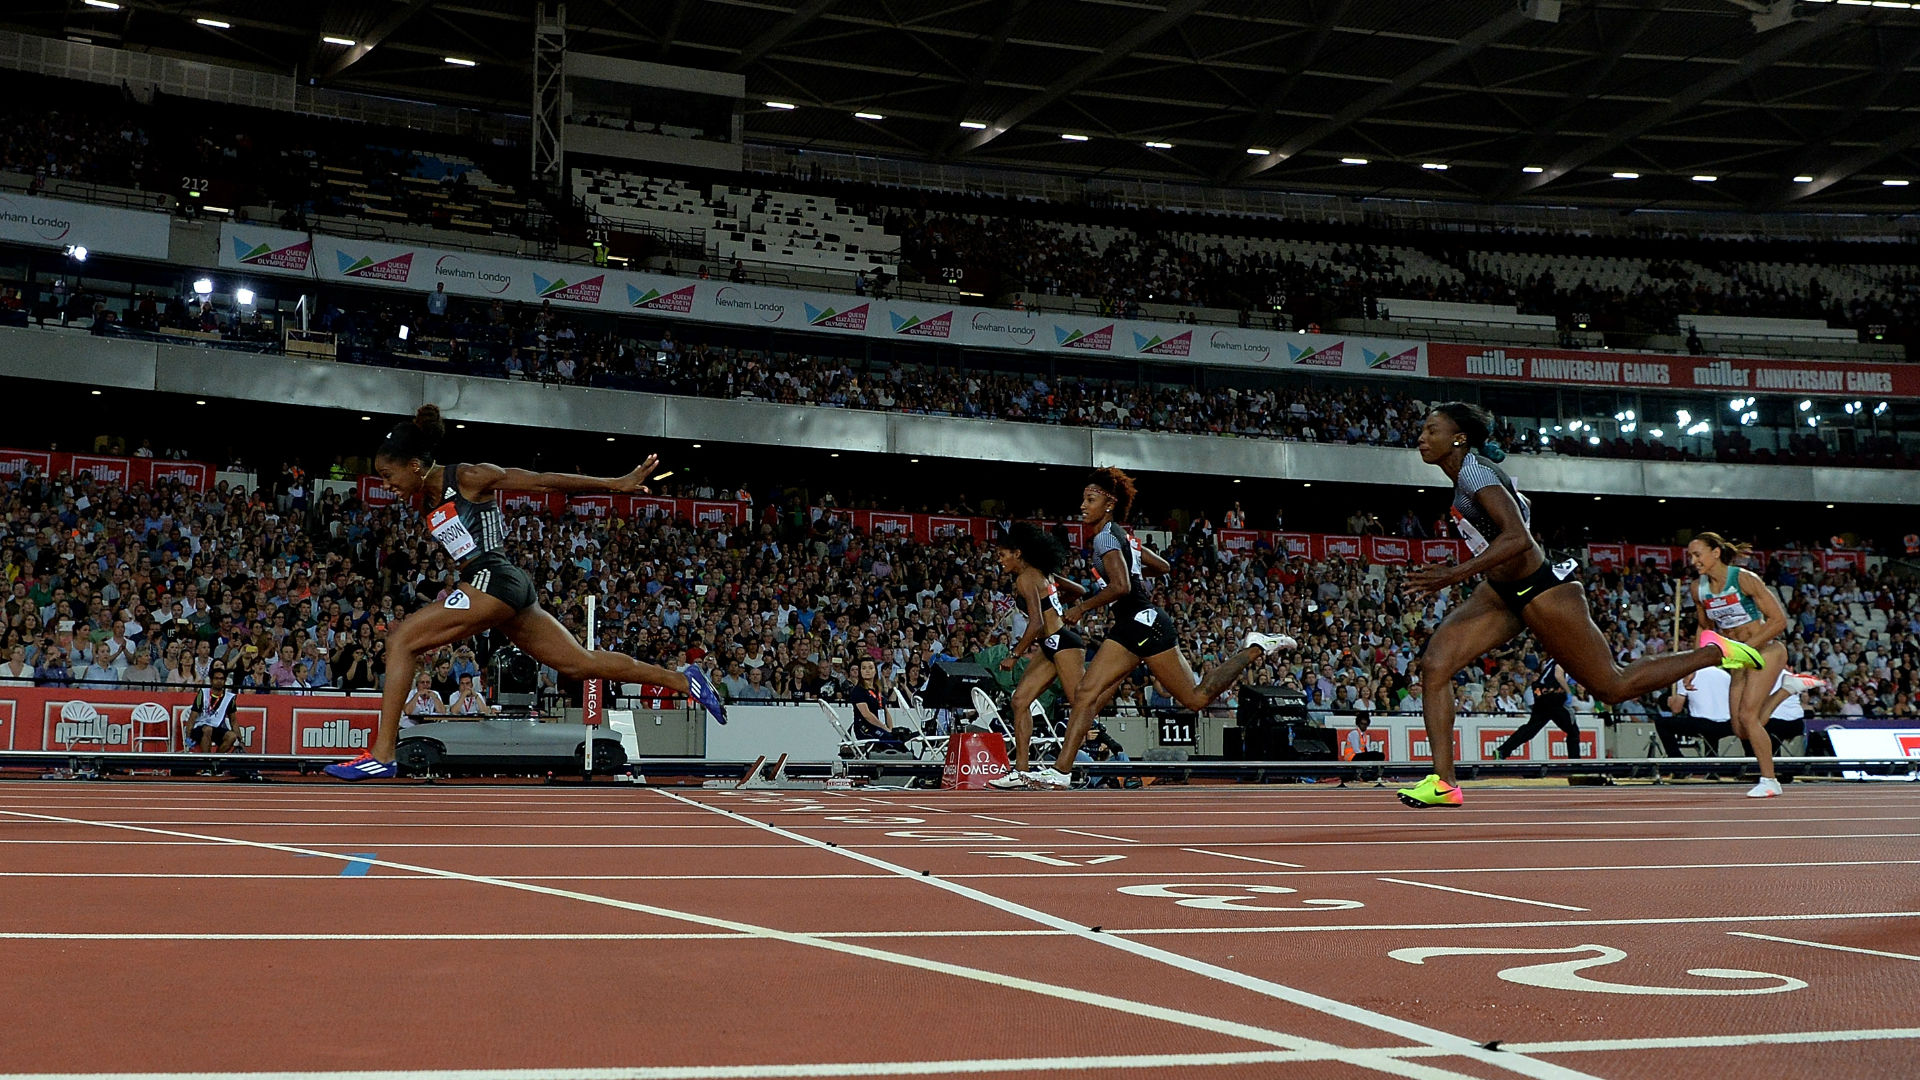 Muller anniversary games at london stadium athletics